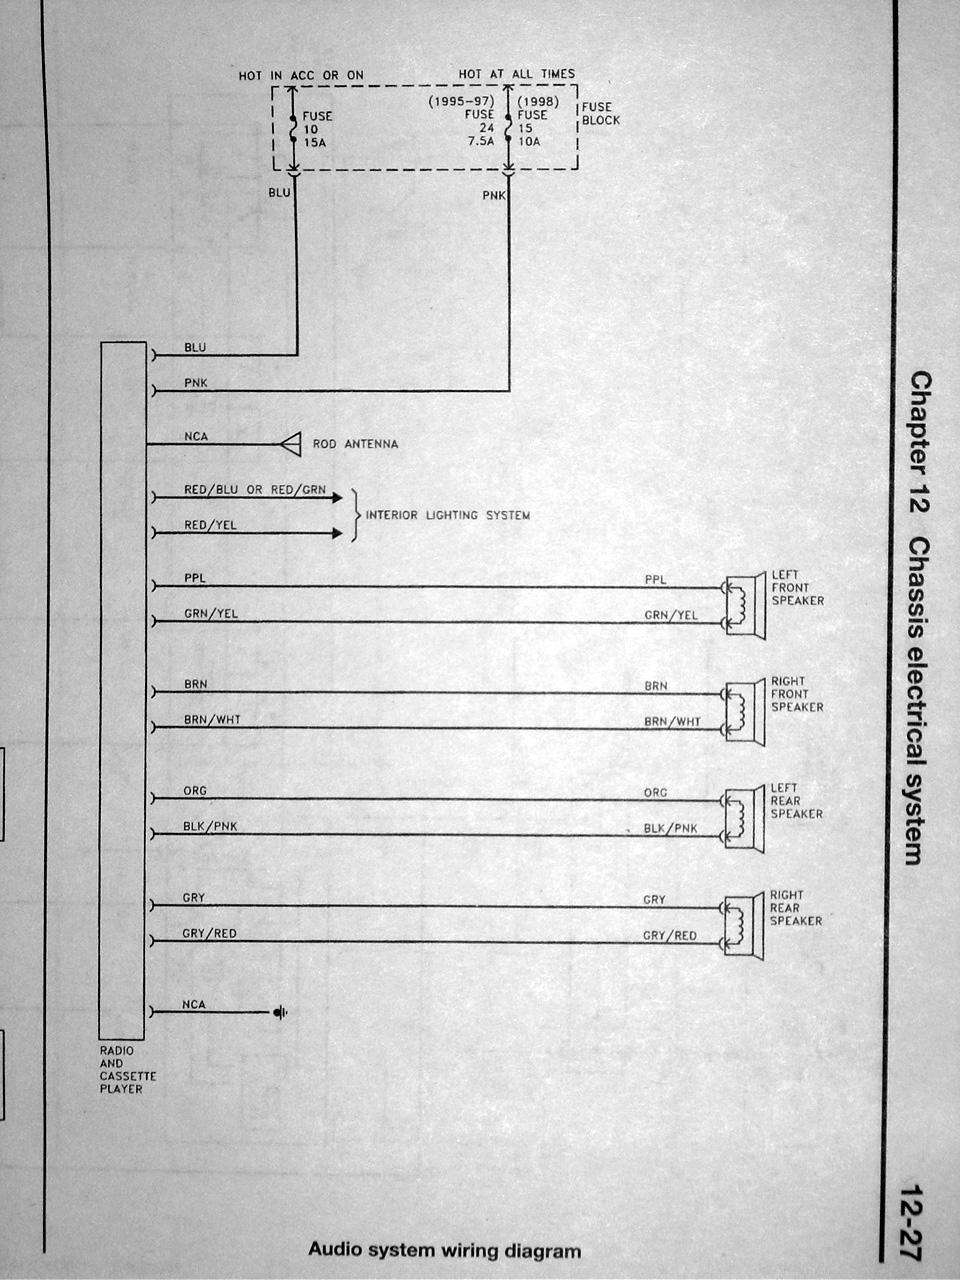 DSC01849?resize=665%2C887 2005 altima 2 5 s radio wiring illumination interior lighting 1998 nissan altima radio wiring diagram at alyssarenee.co